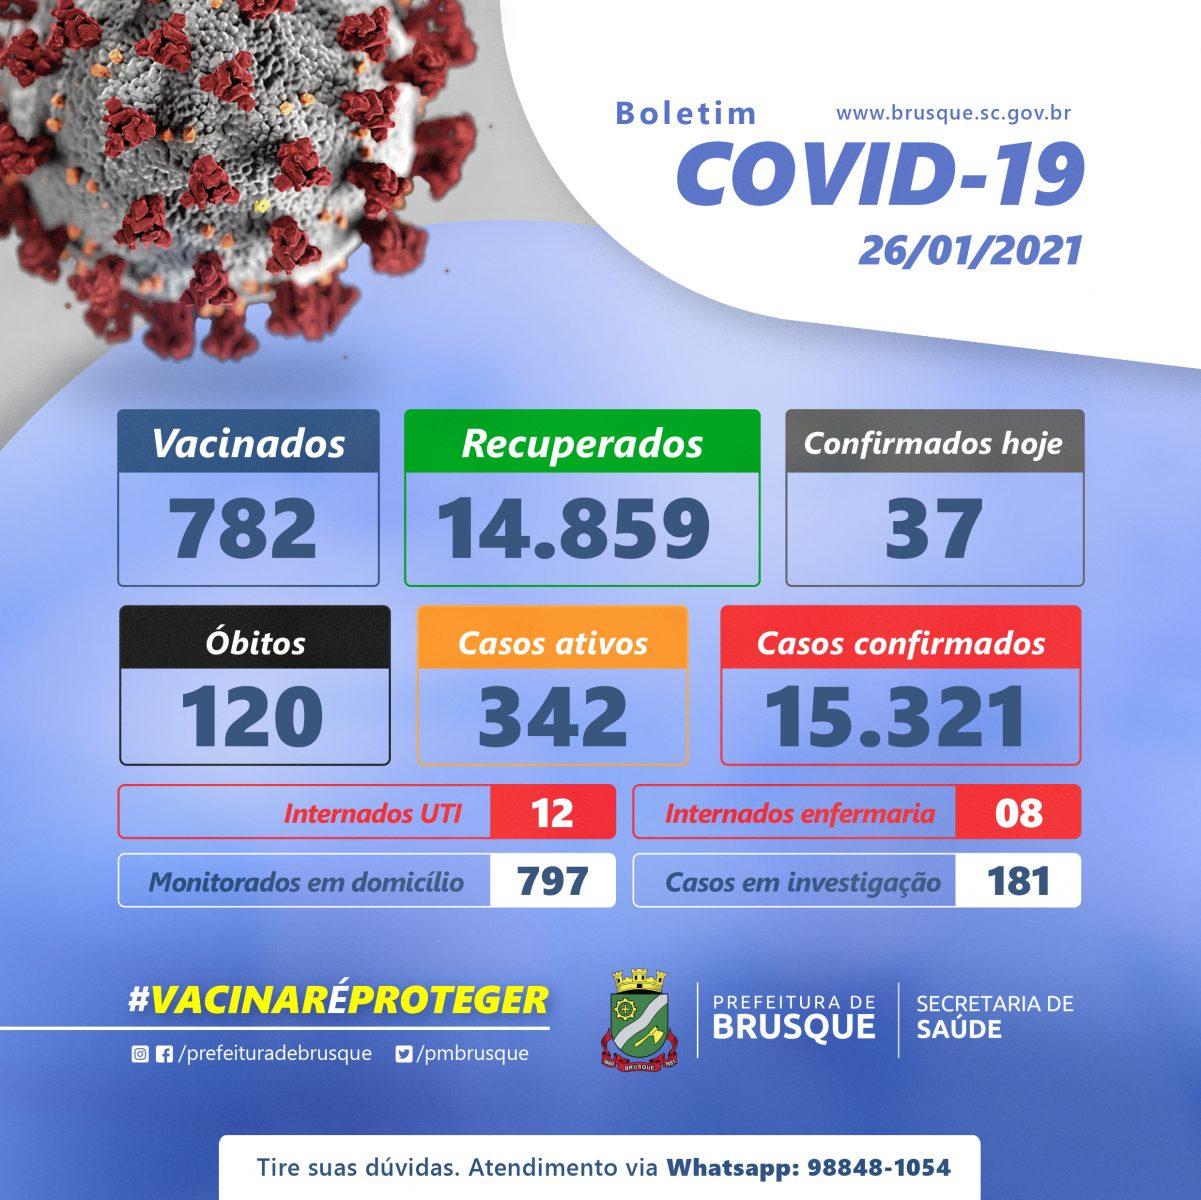 Covid-19: Confira o boletim epidemiológico desta terça-feira (26)